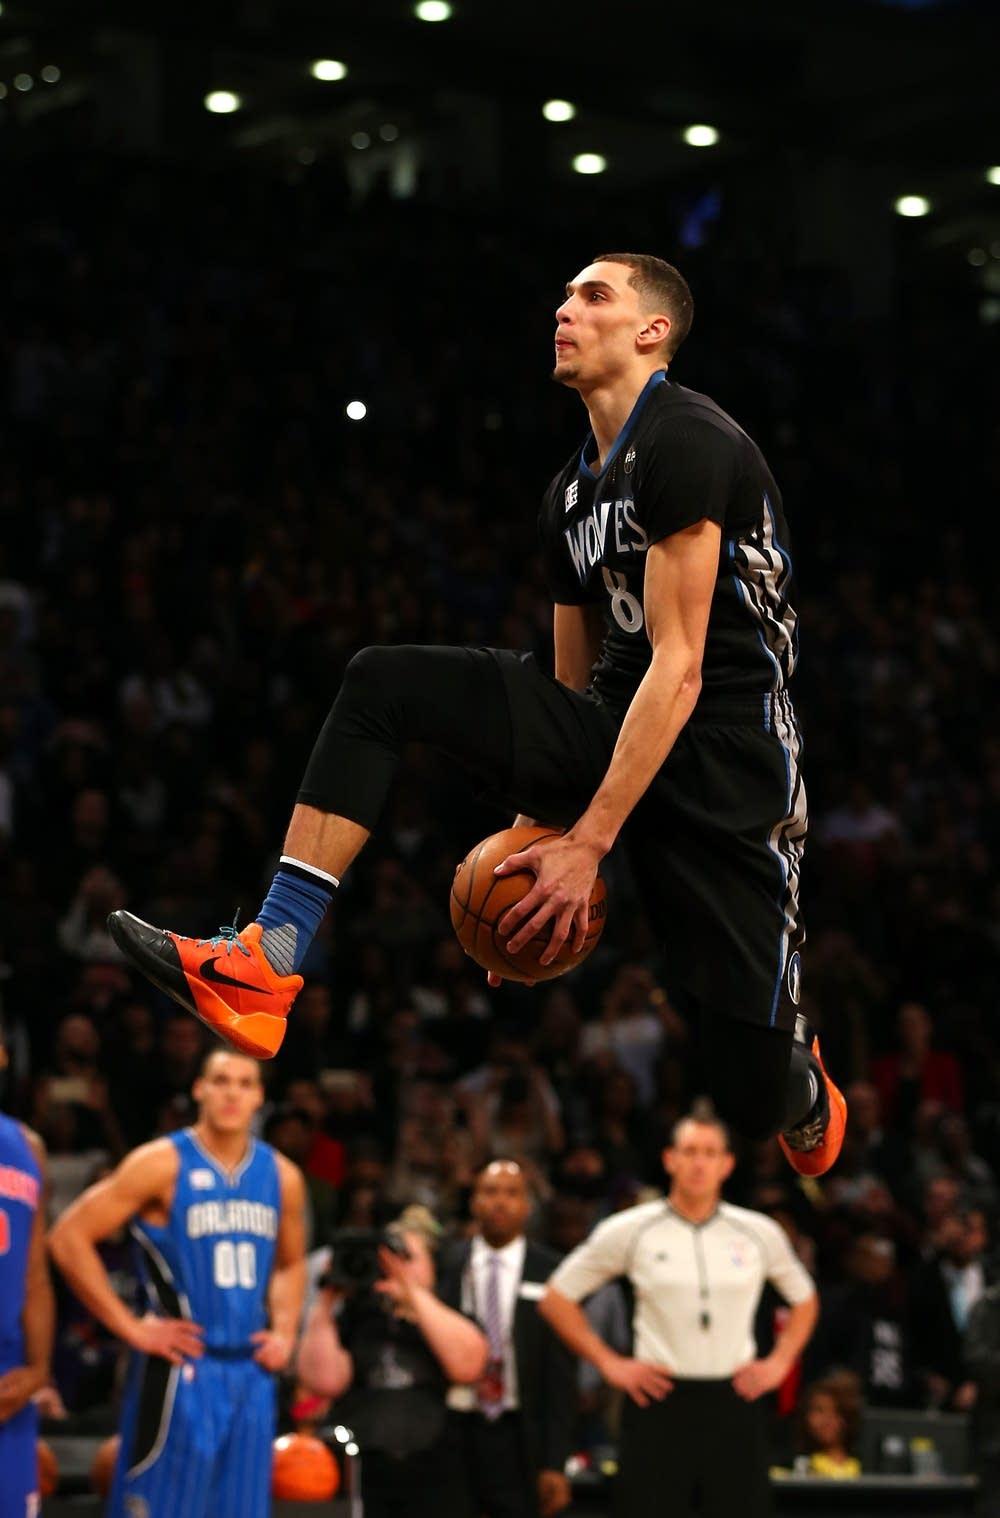 Minnesota's Zach LaVine wins dunk contest again   MPR News